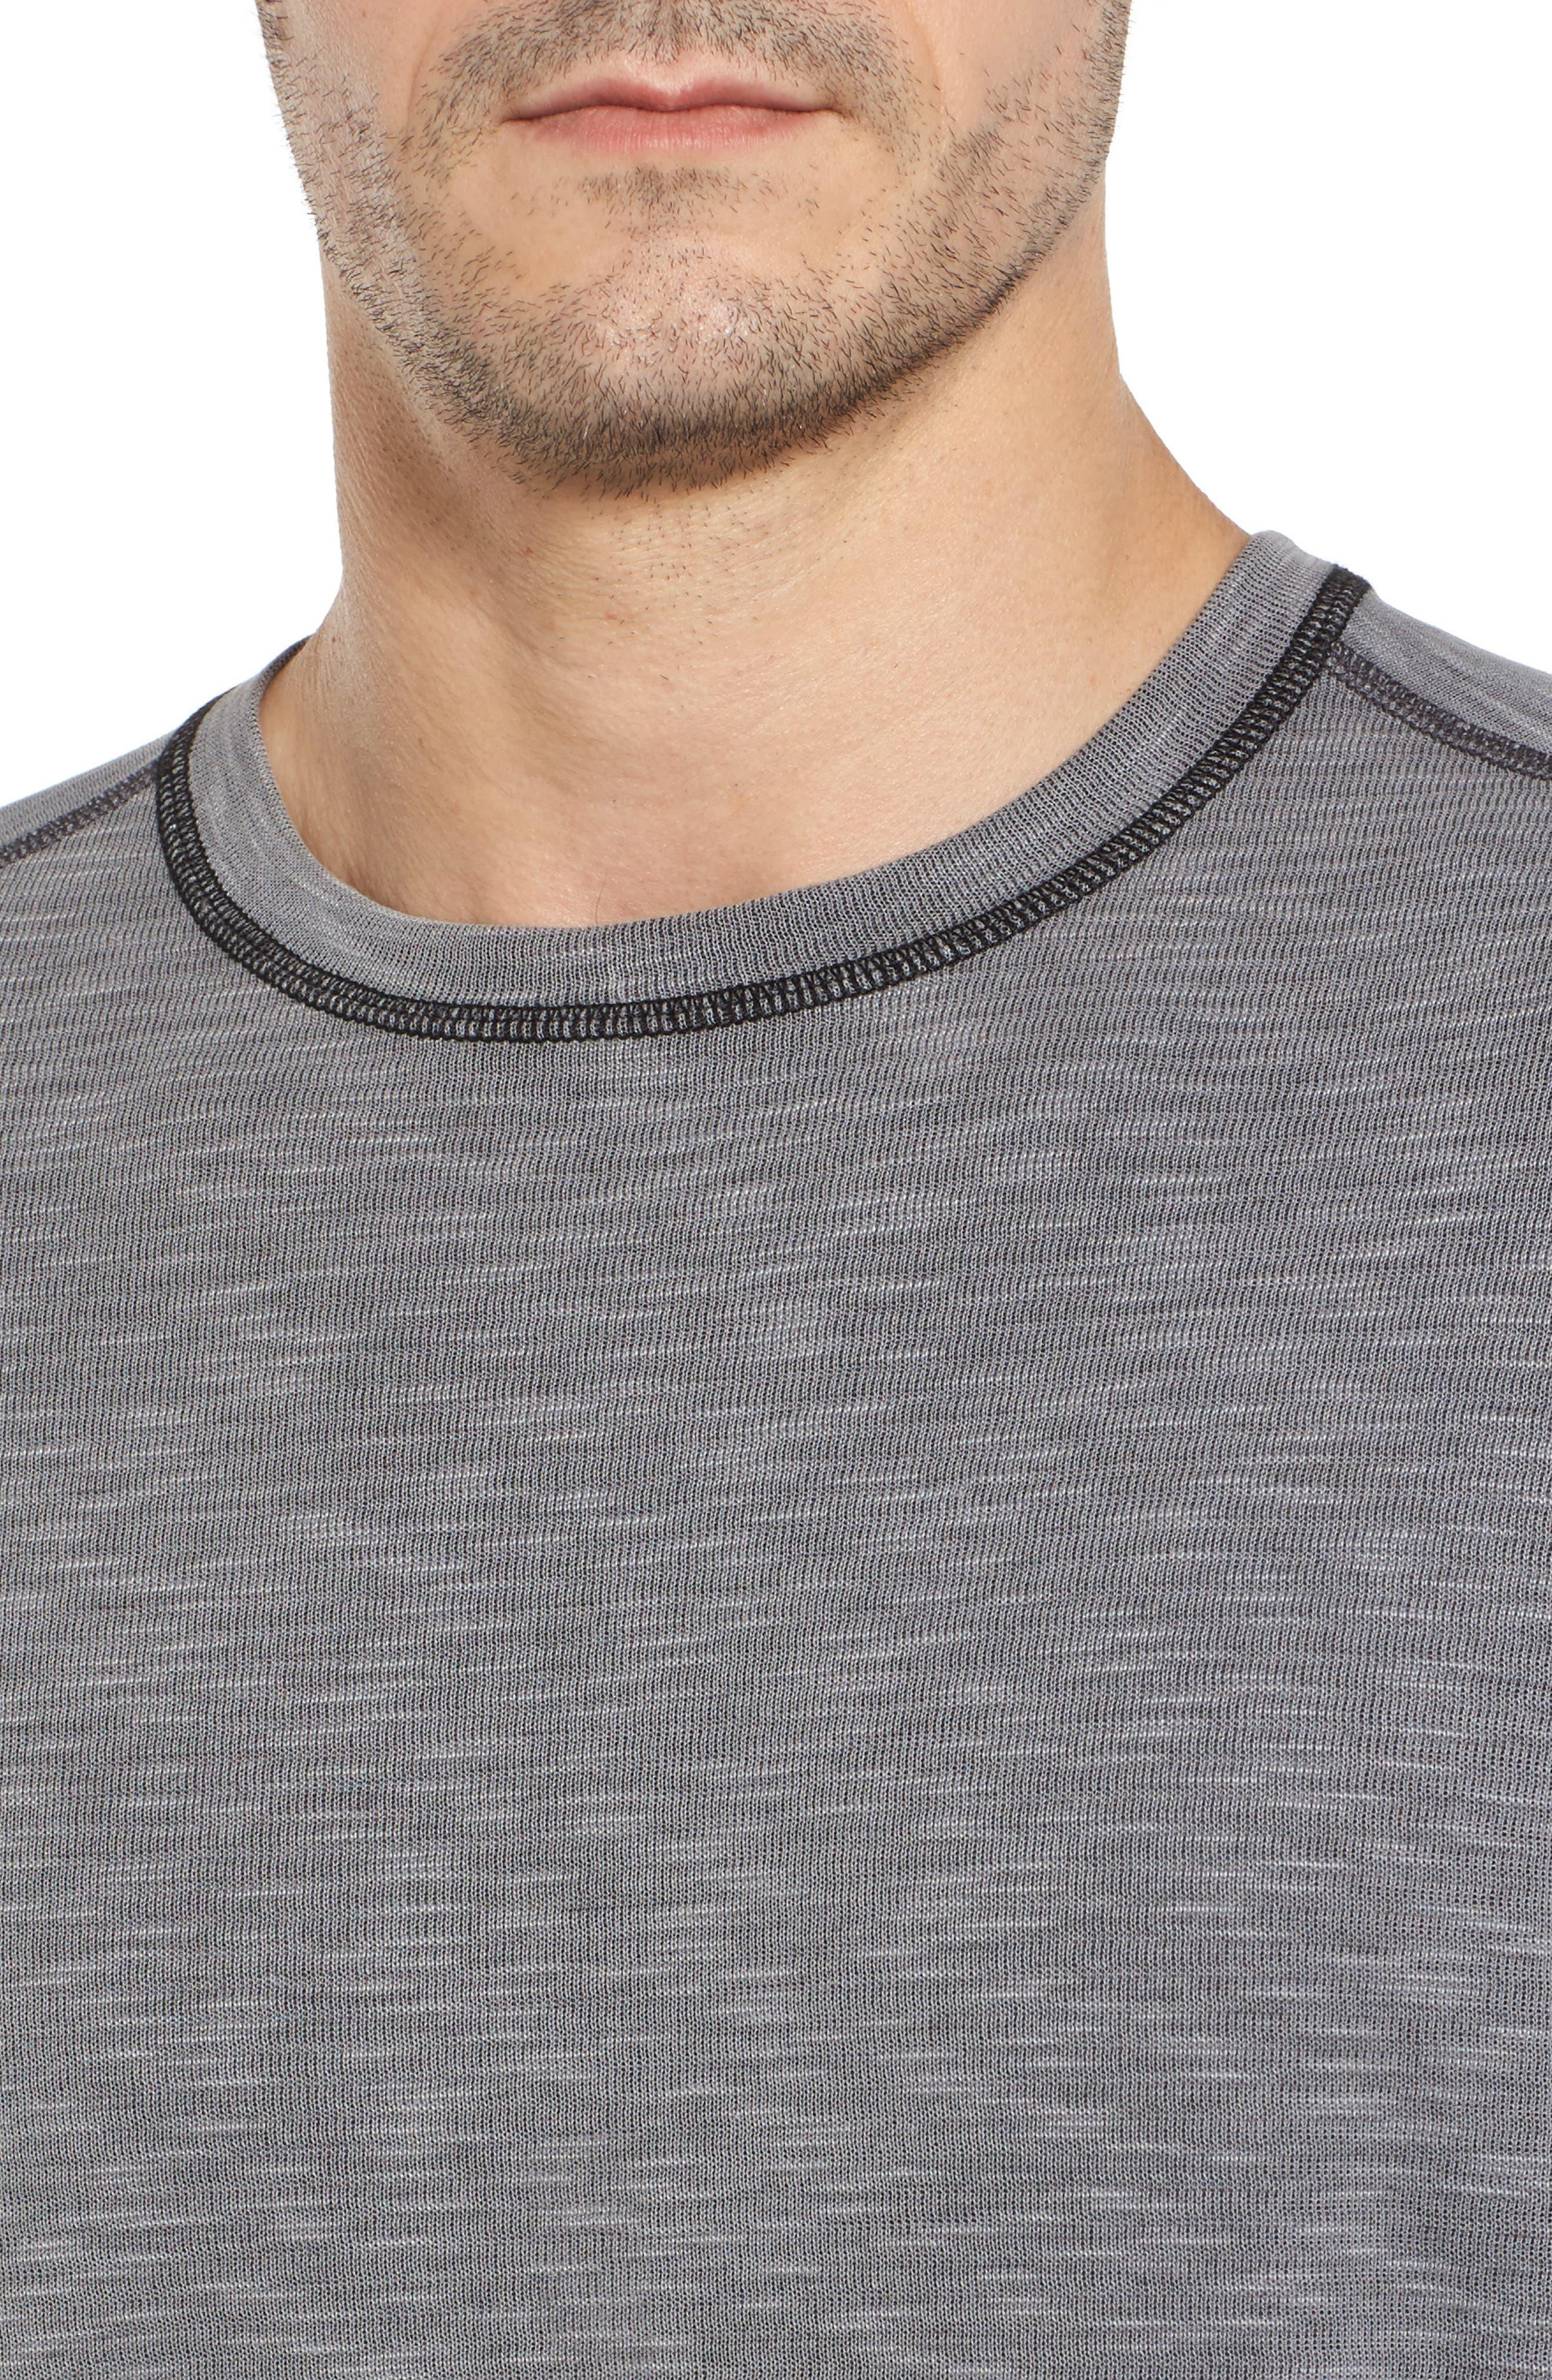 Flip Tide Long Sleeve T-Shirt,                             Alternate thumbnail 5, color,                             Coal